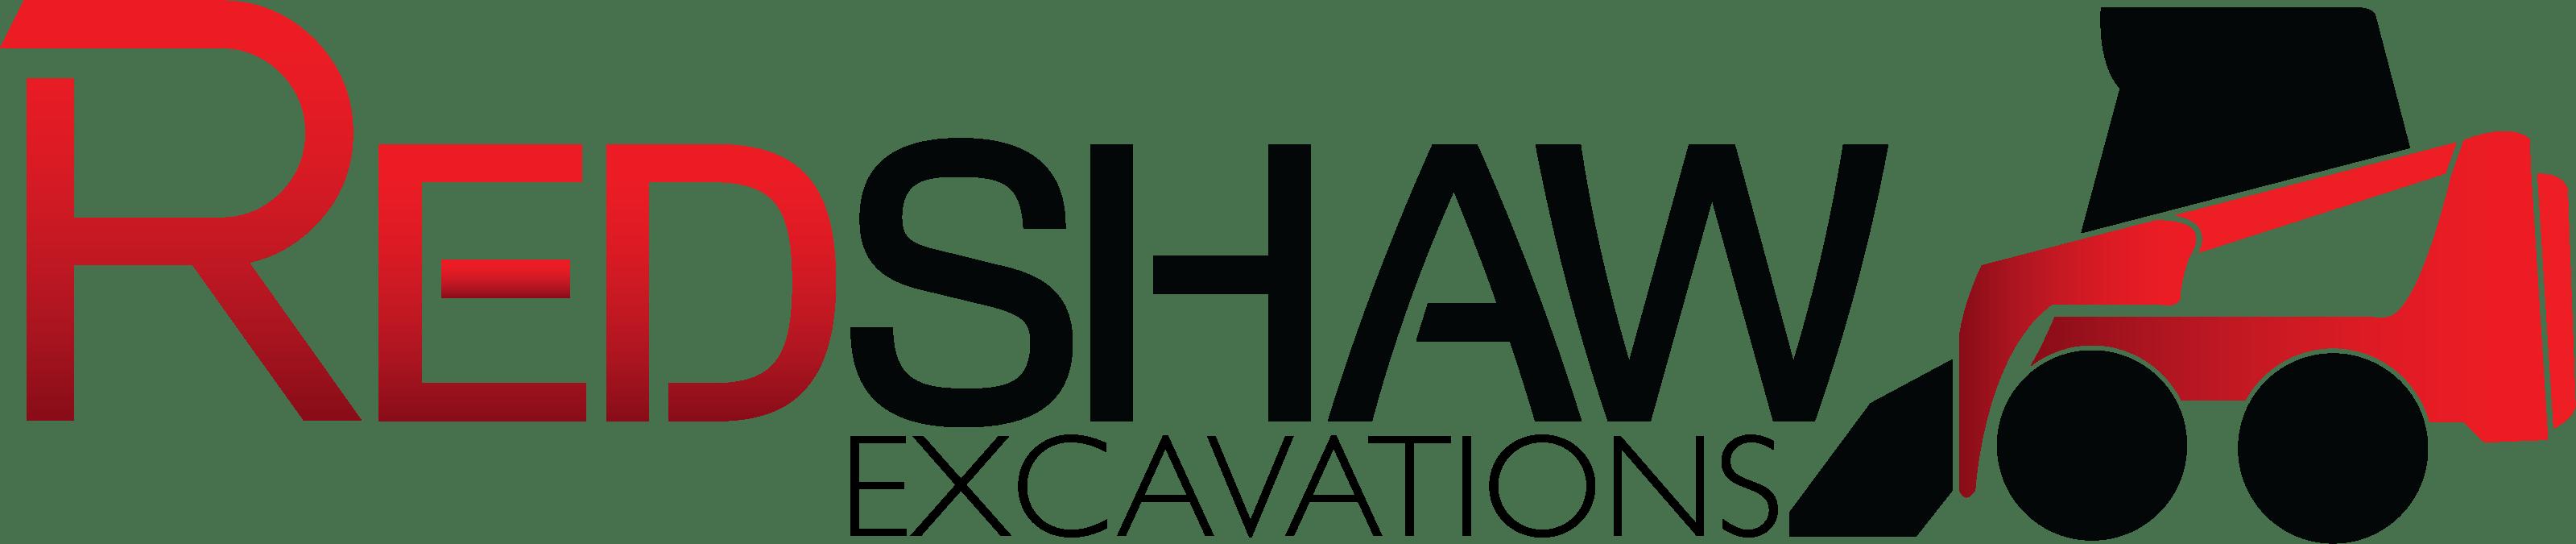 Redshaw Excavations